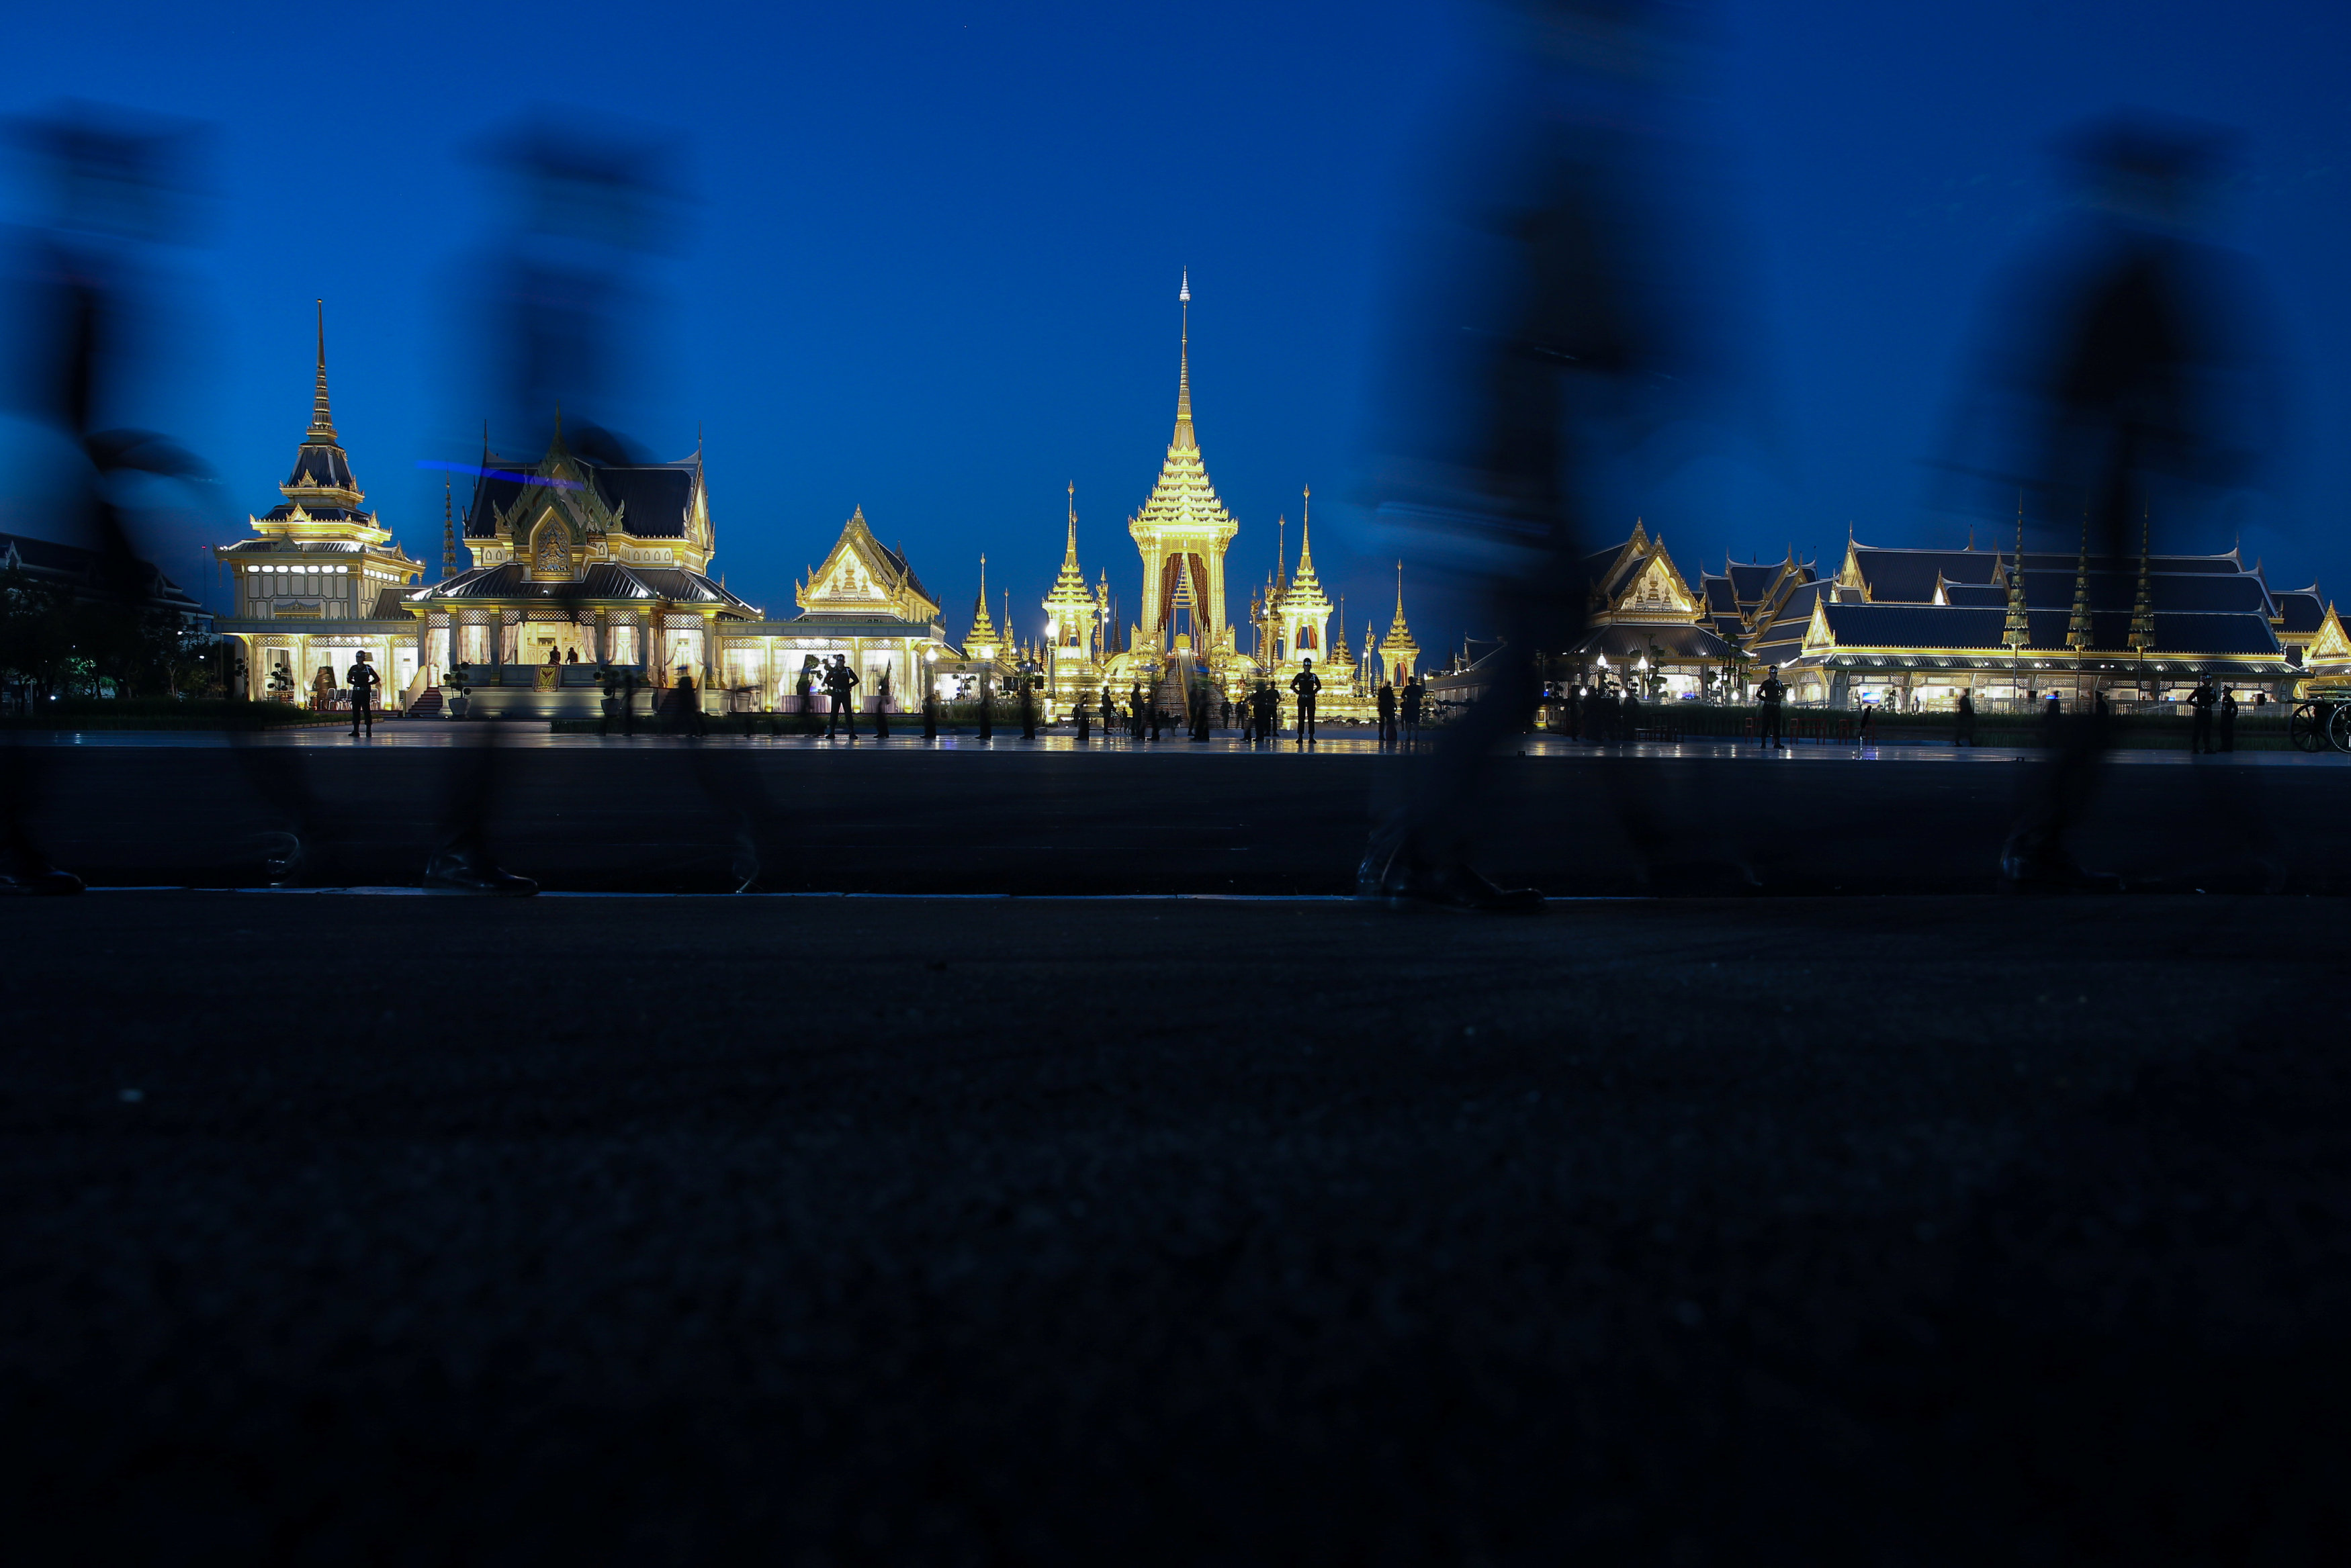 Thailand rehearses $90 million funeral for late late King Bhumibol Adulyadej